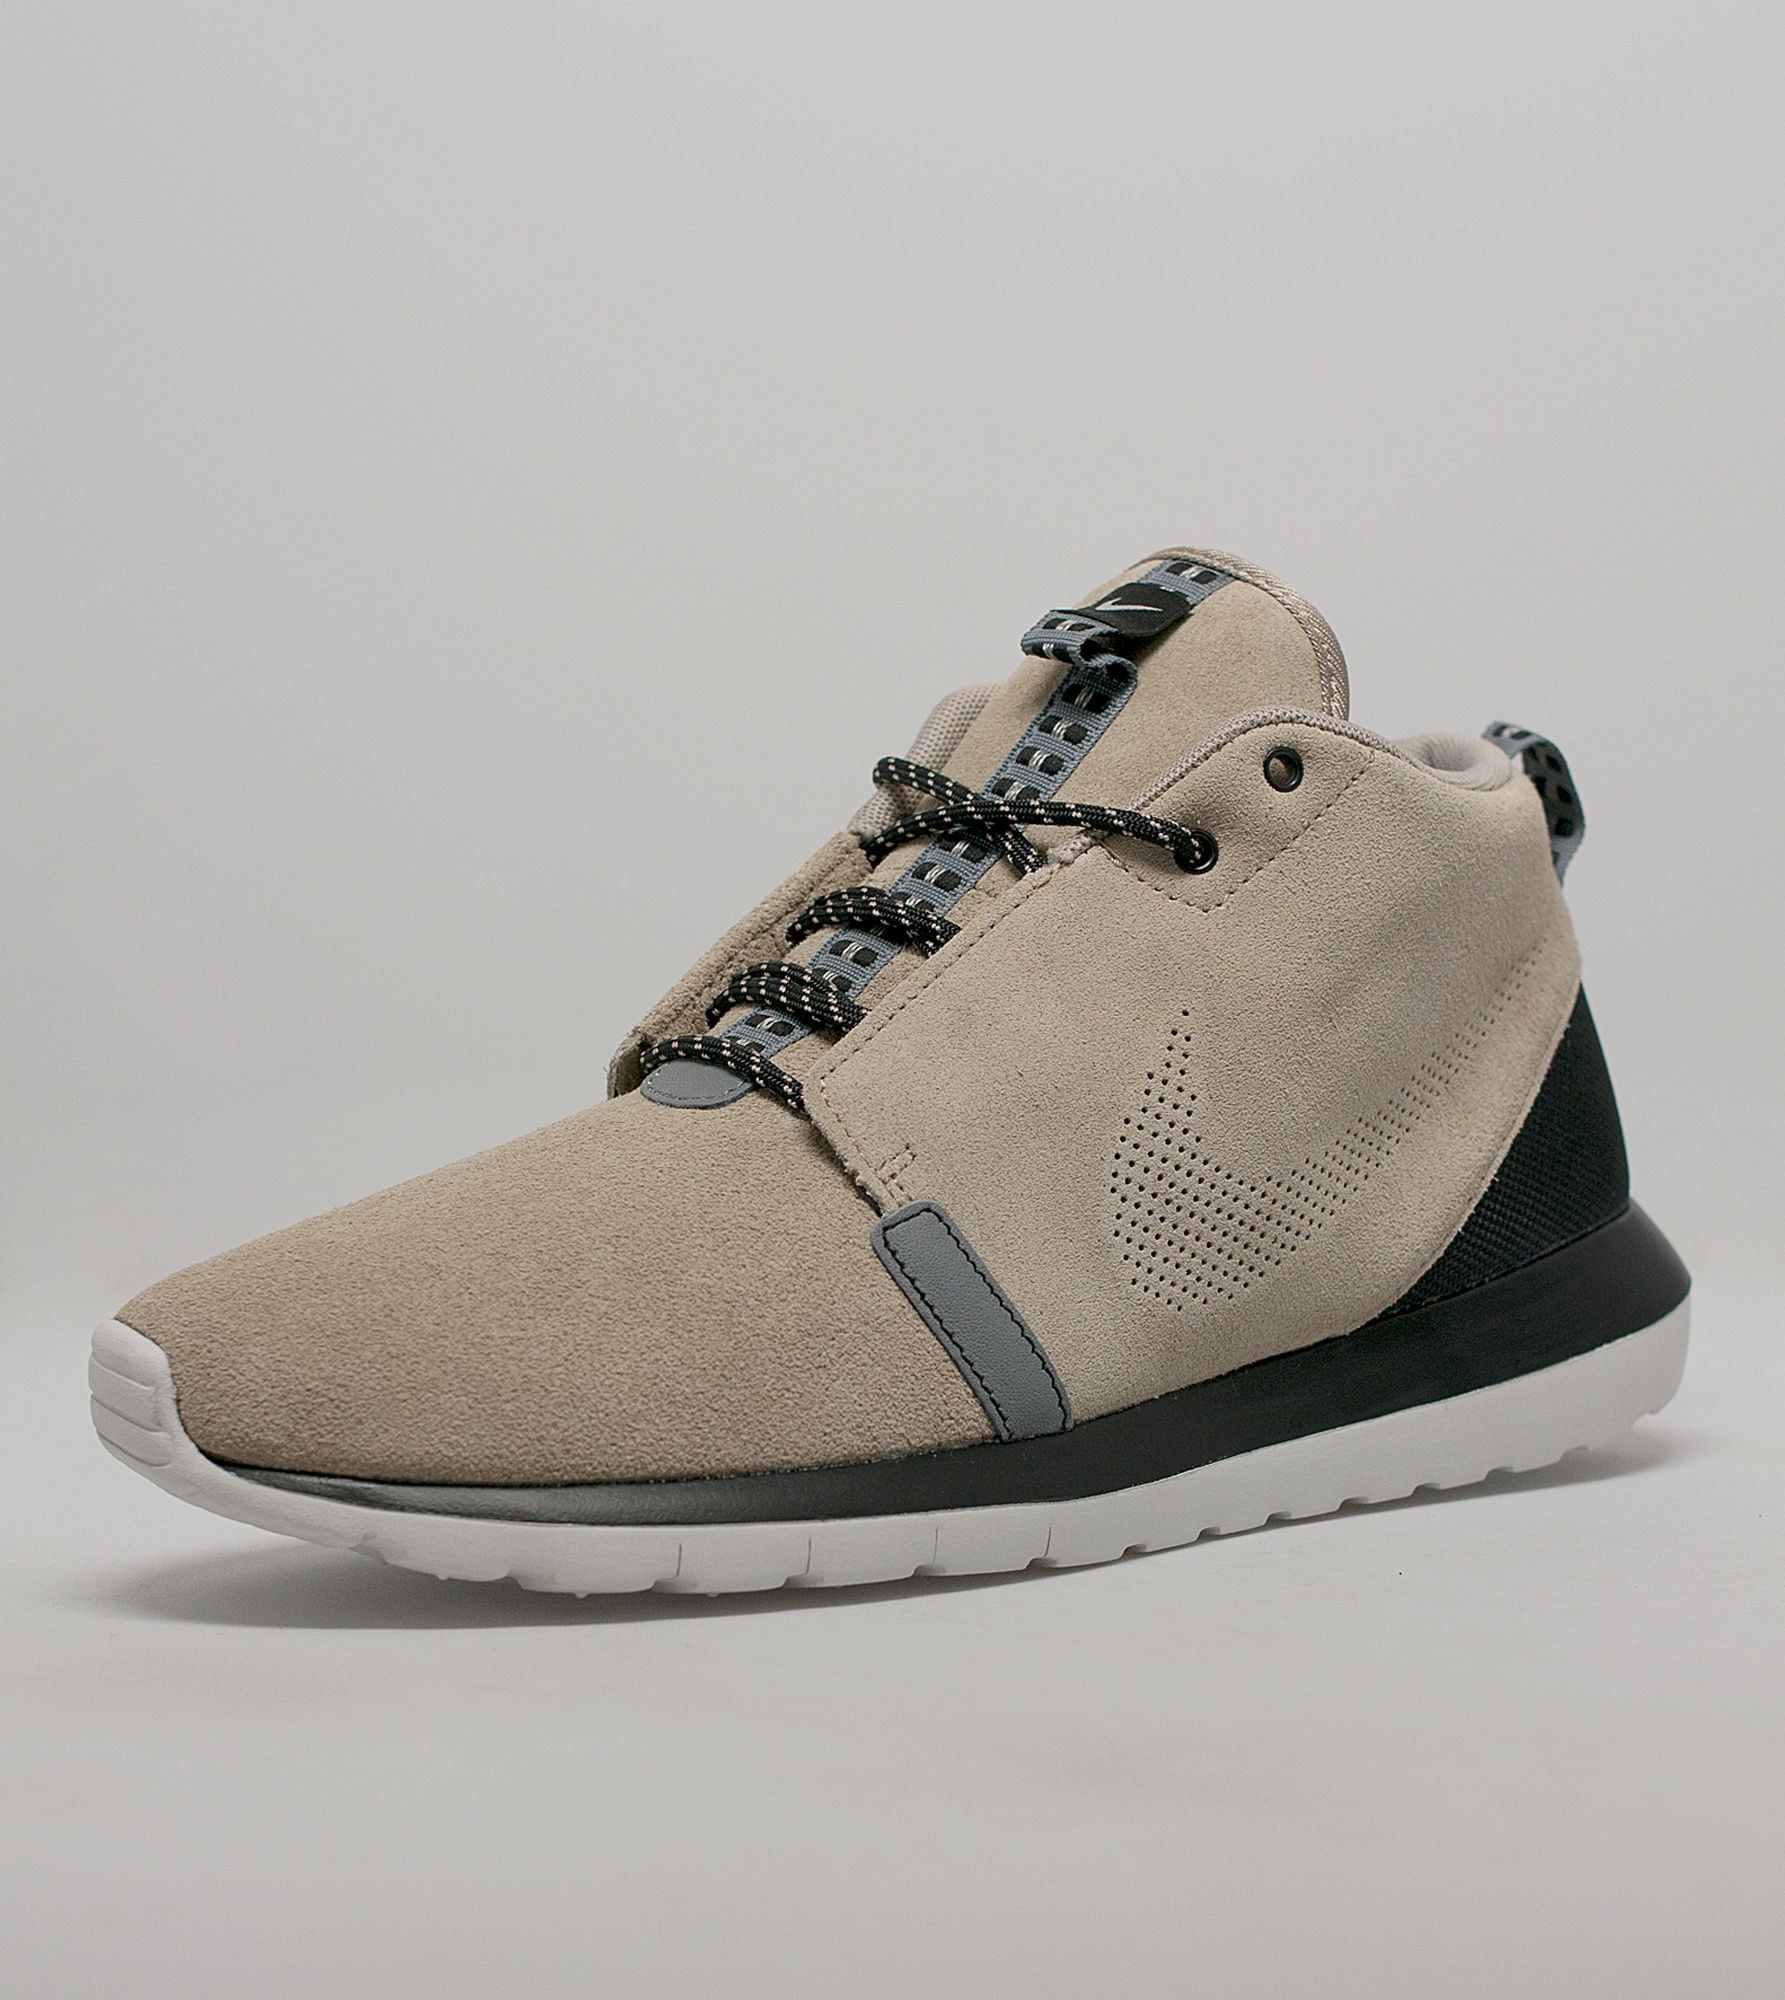 new style nike roshe nm sneakerboot f49e8 328ff